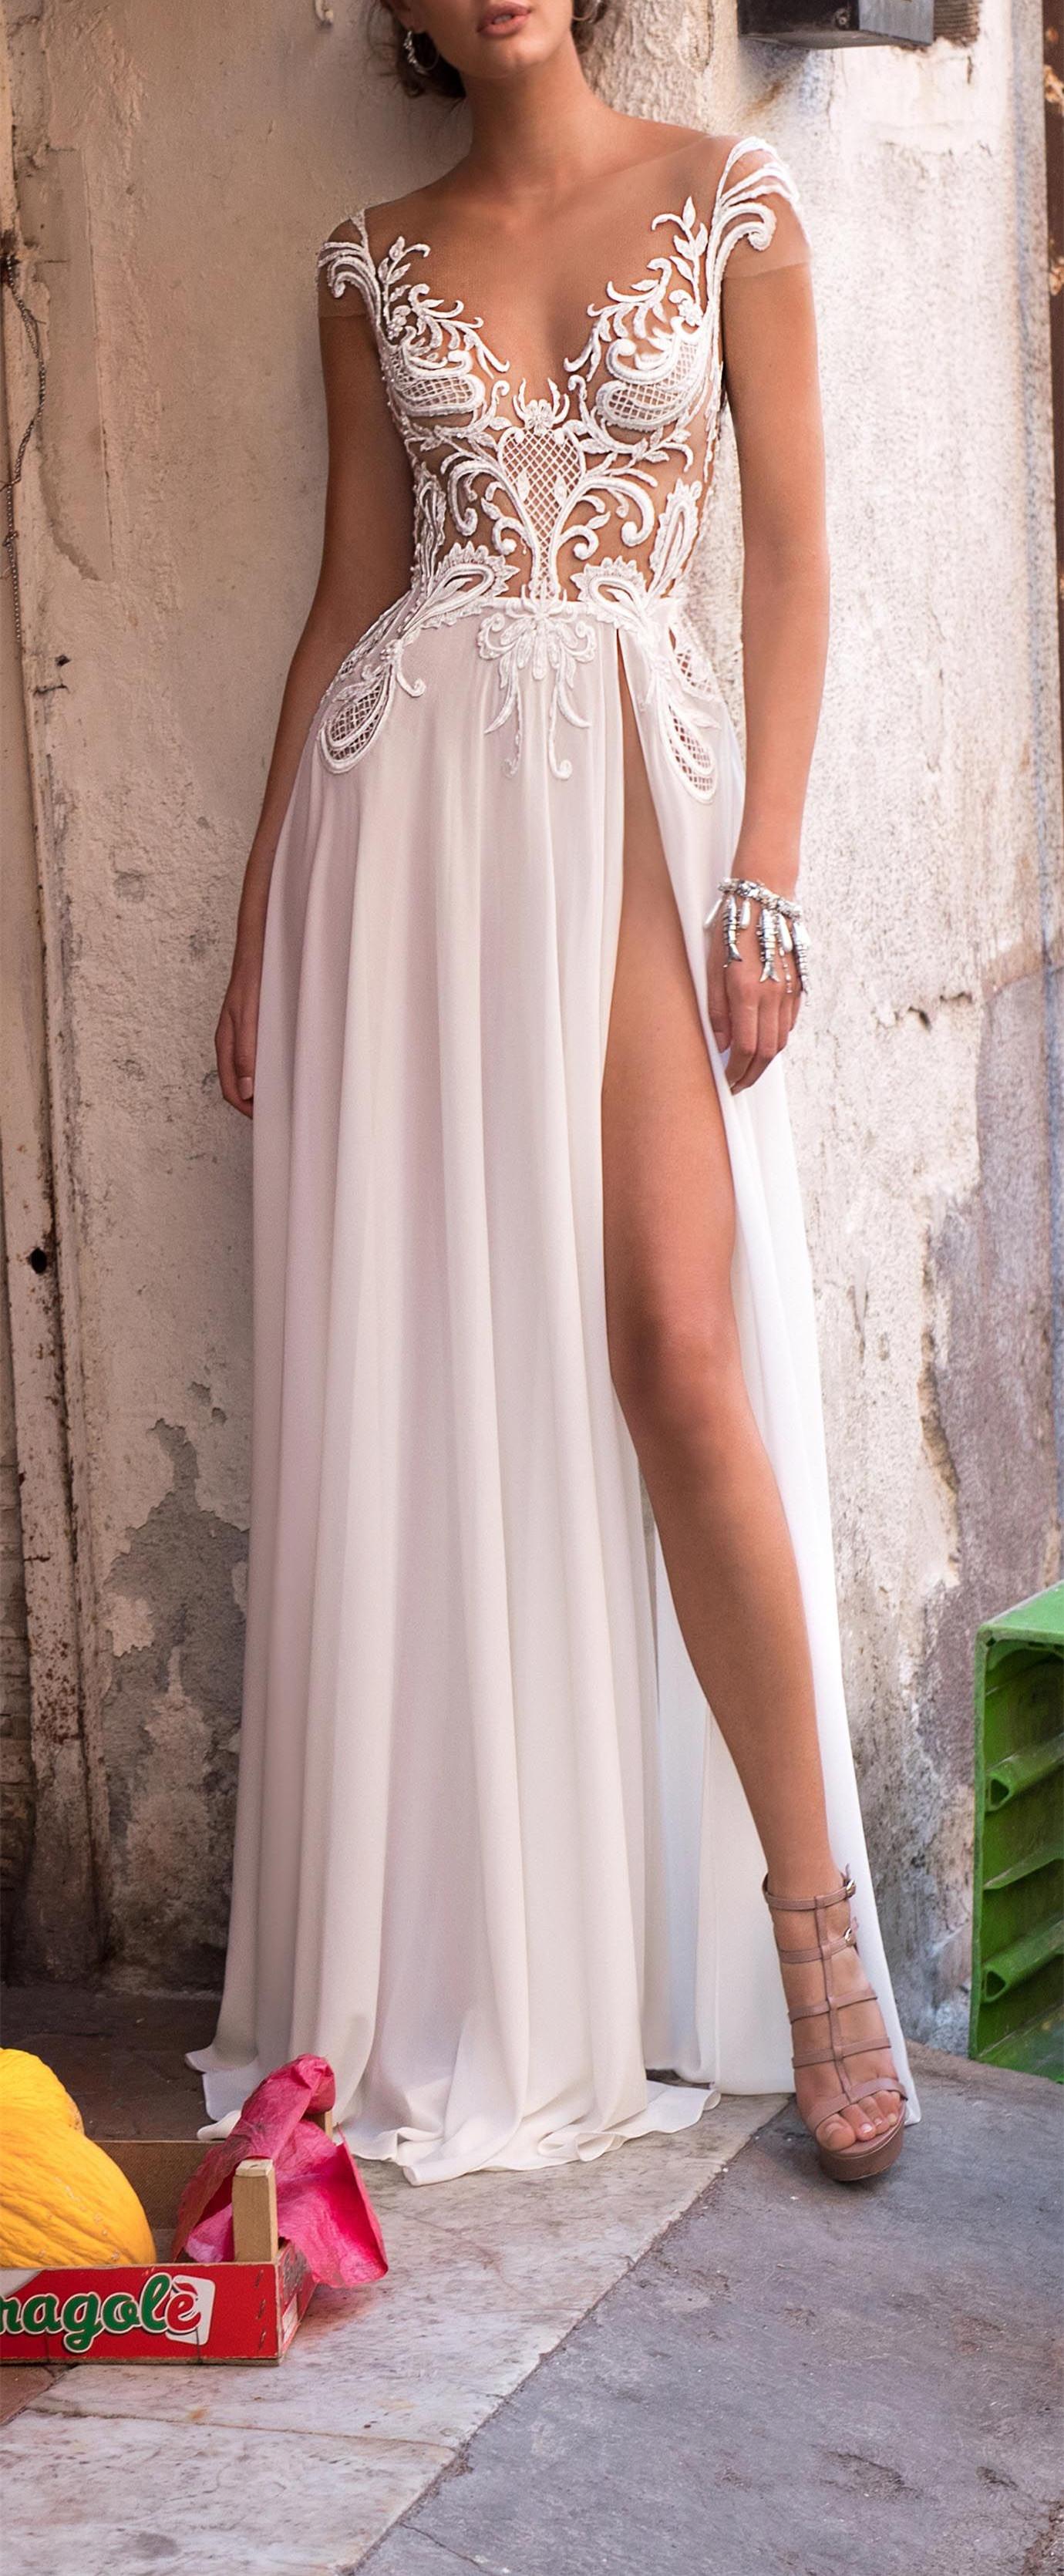 Elegant White Lace Chiffon Wedding Dress Off Shoulder Bridal Dress